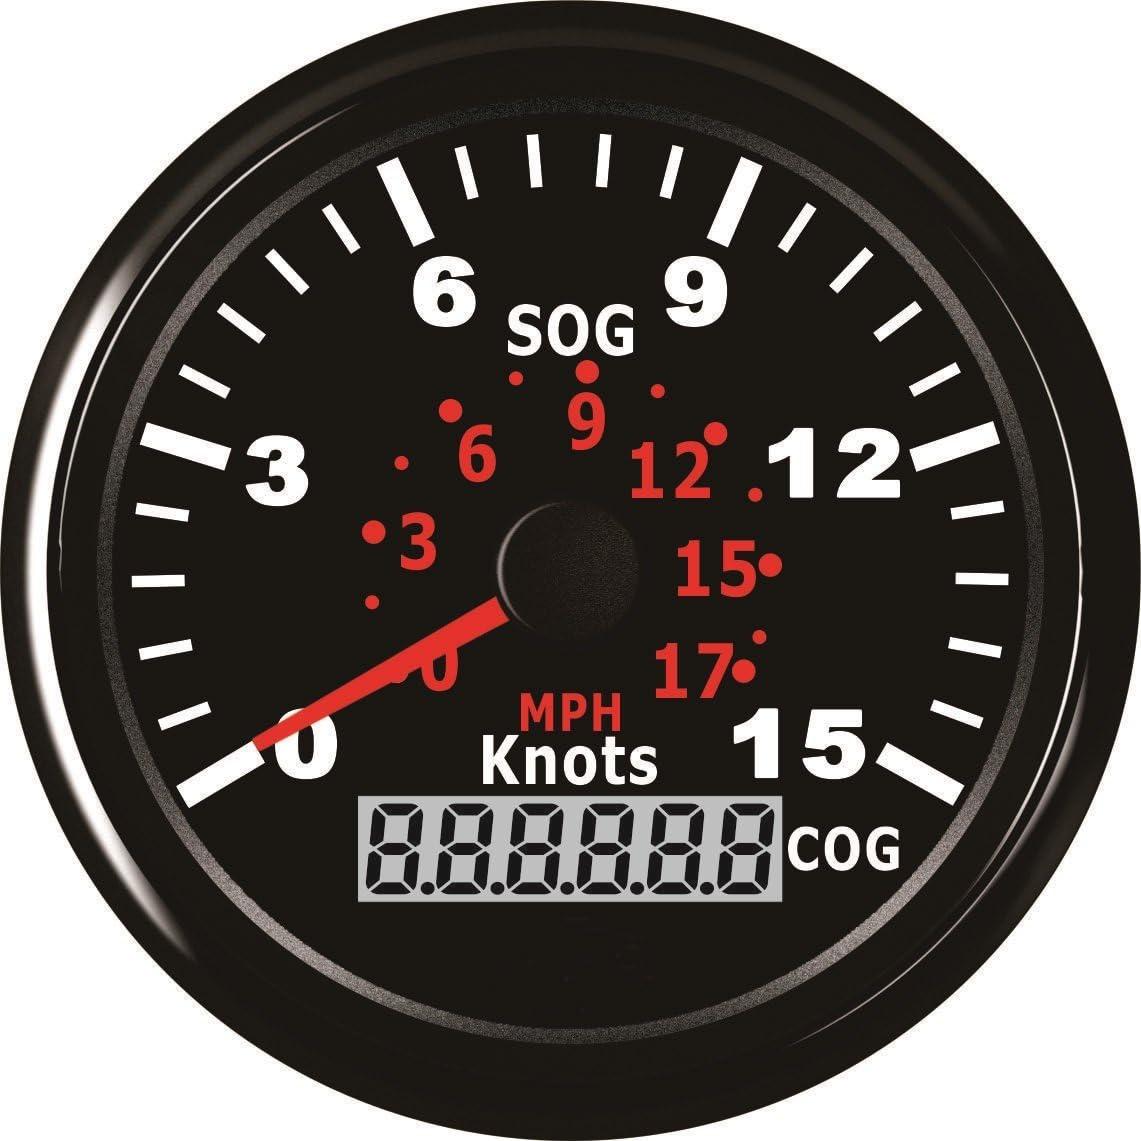 GPS Digital LED Backlight Speedo MPH /& Knots for Boats Motorcycle 85mm Black